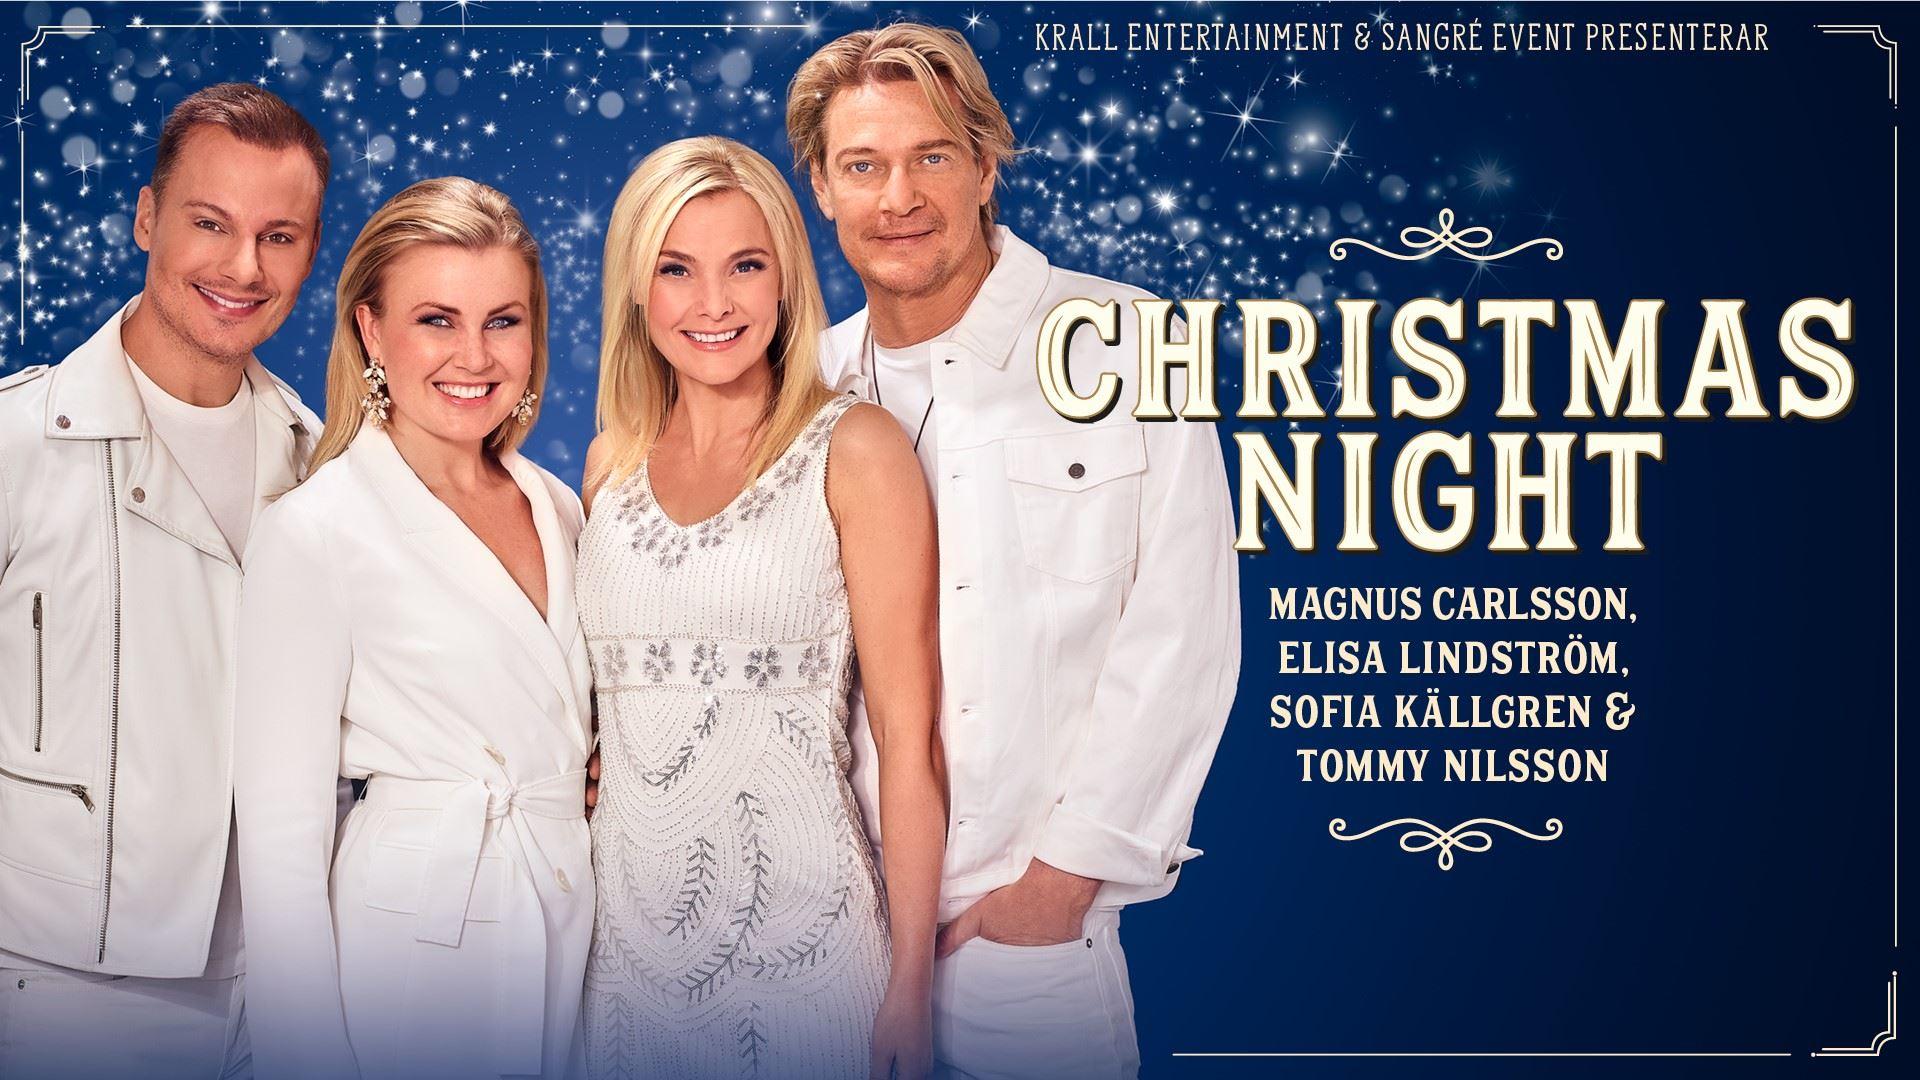 Concert Christmas Night